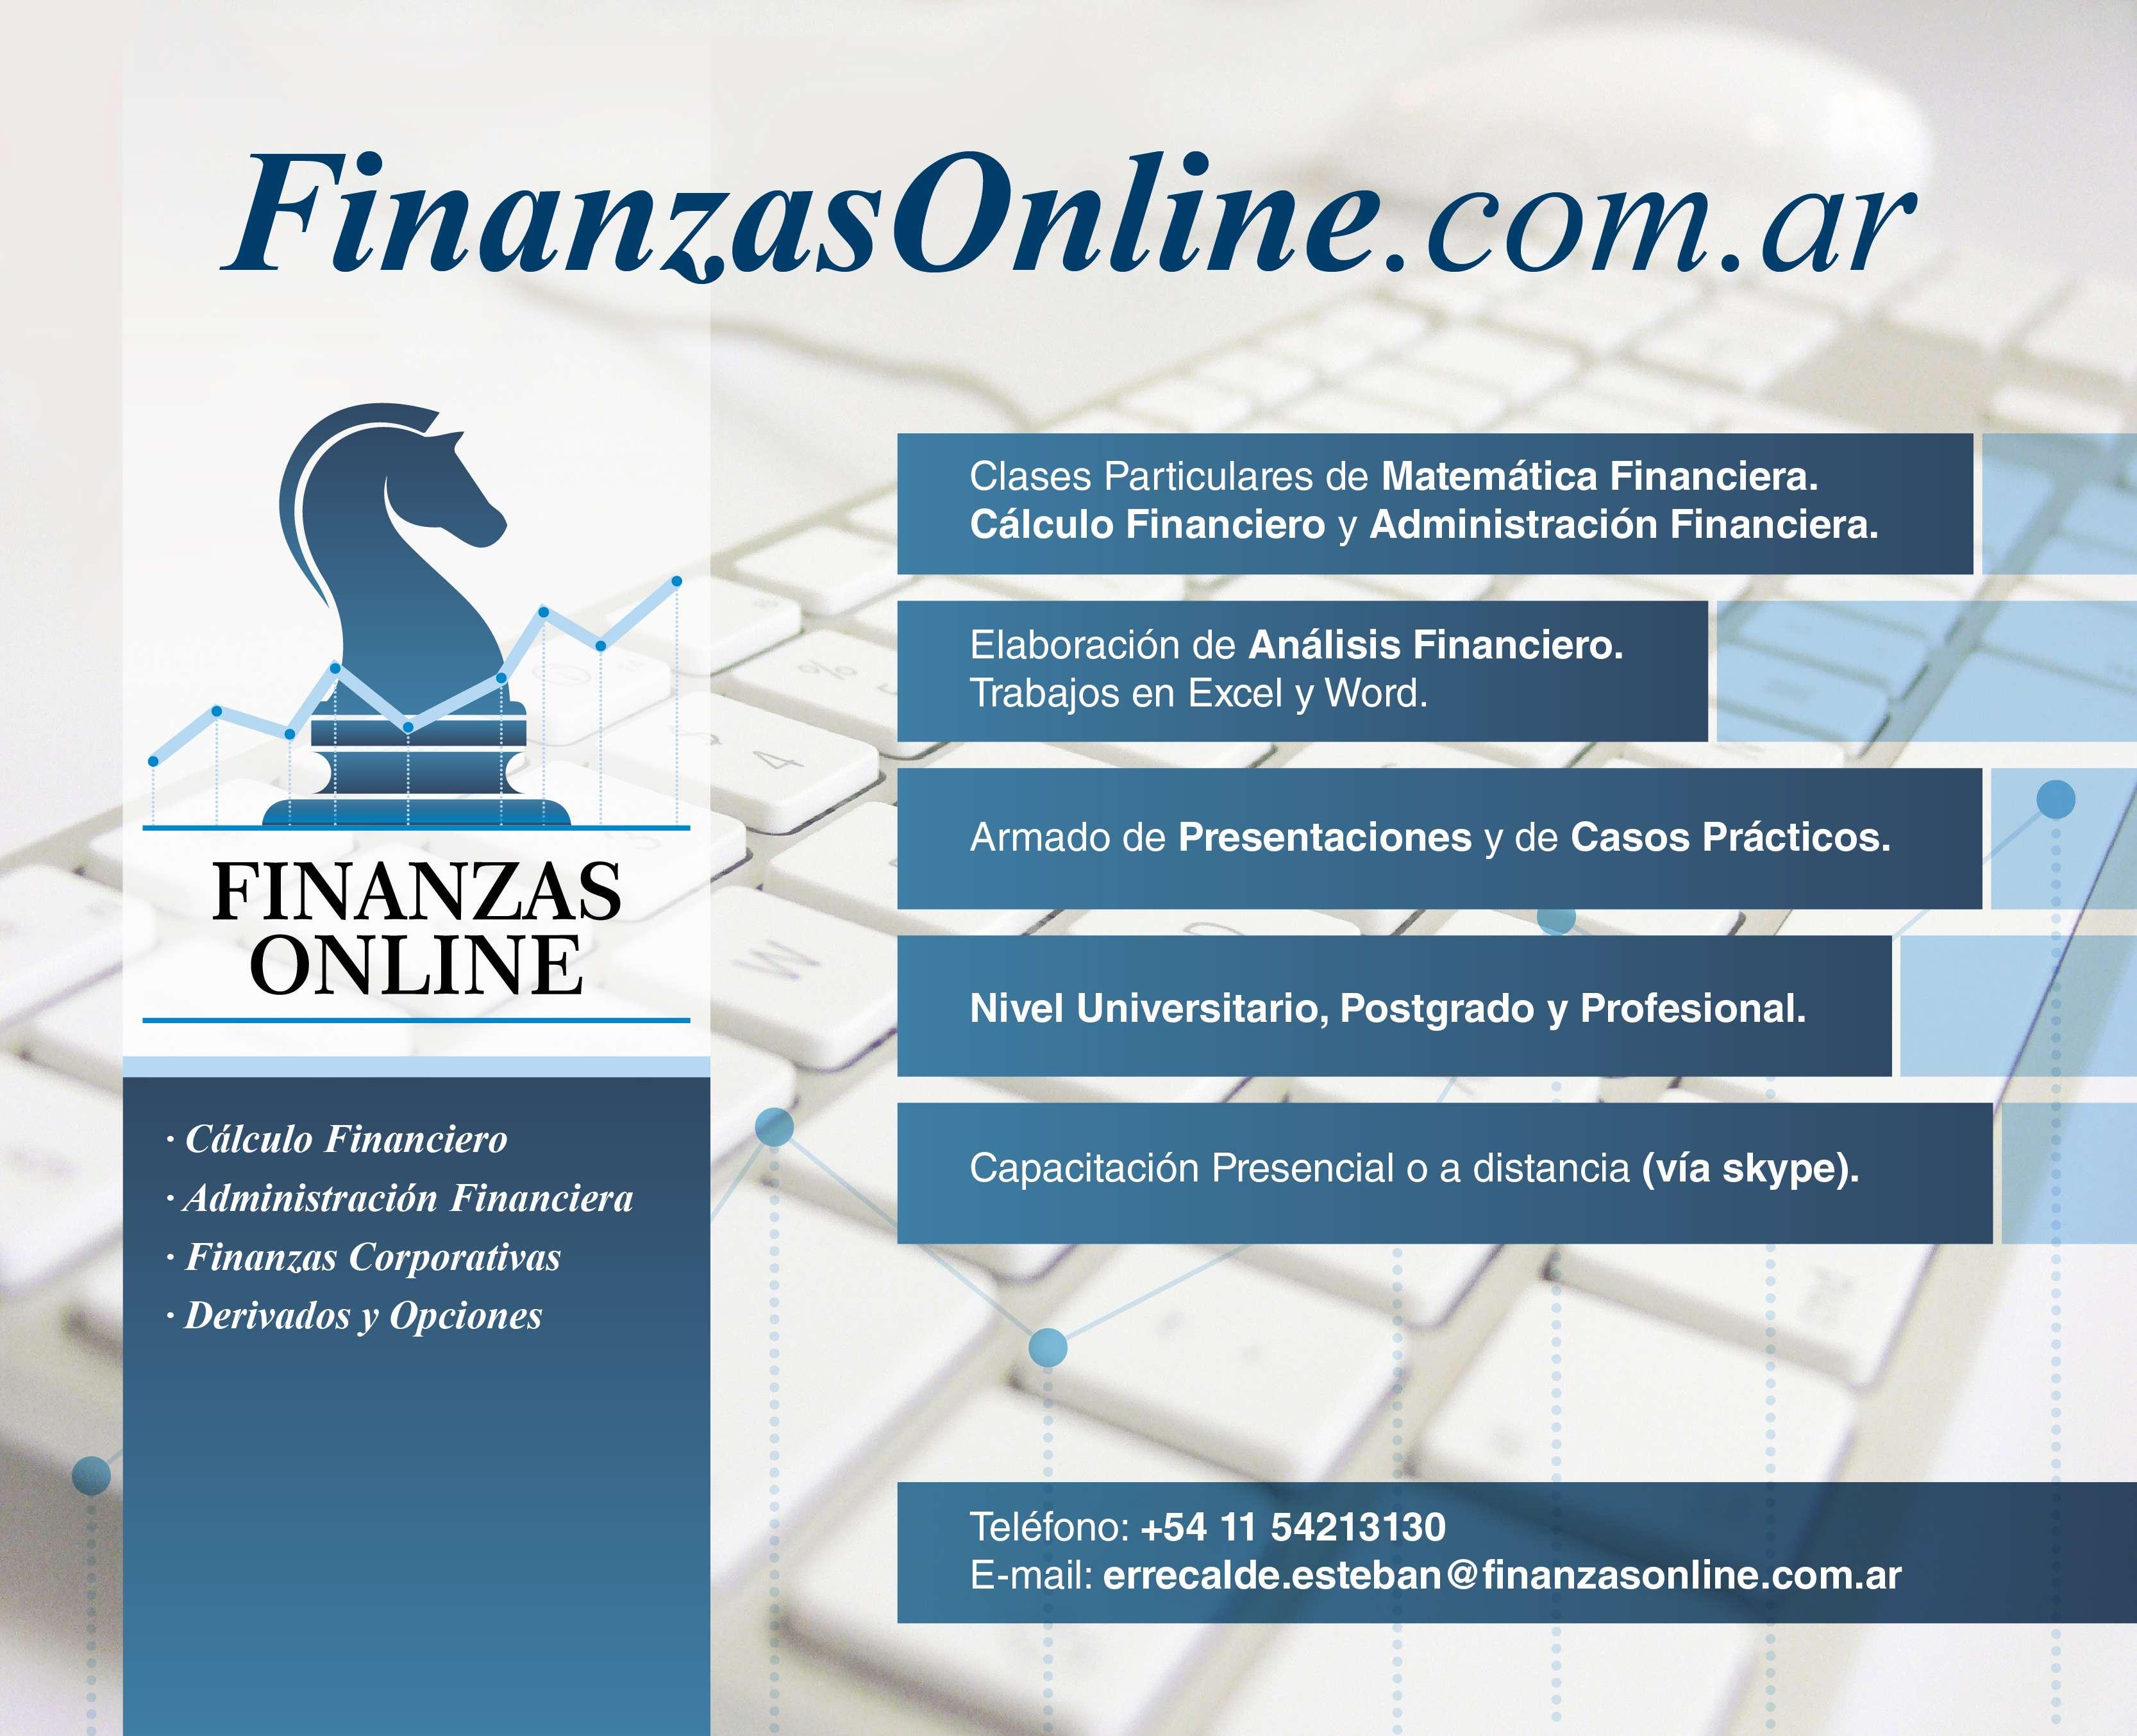 Imagen Finanzas Online